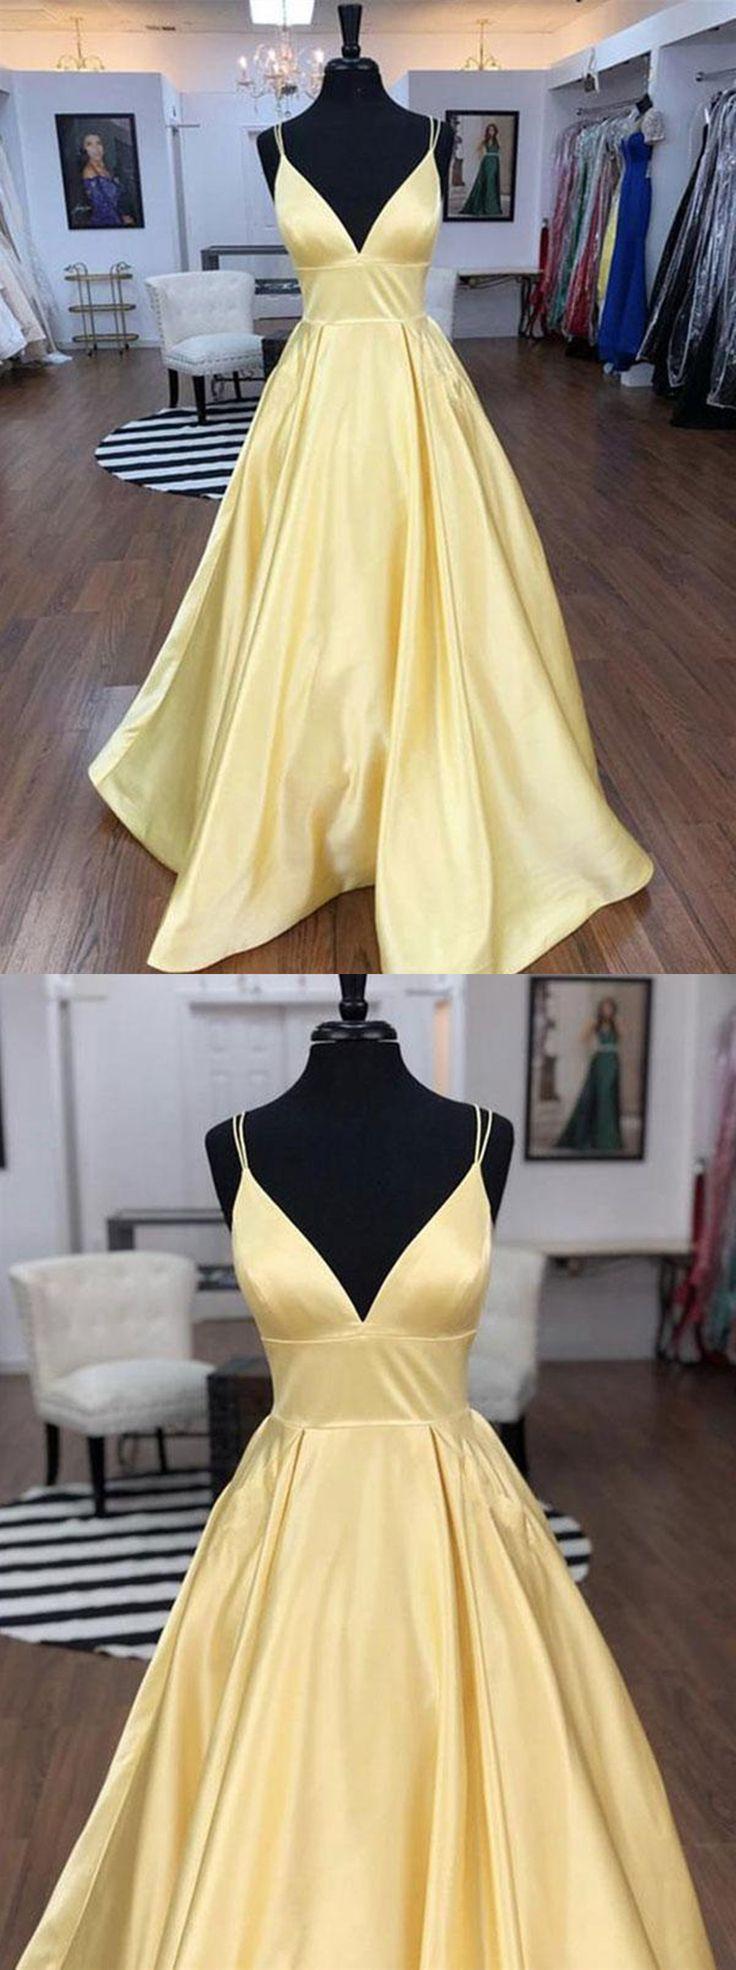 A Line V Neck Floor Length Yellow Prom Dresses, V Neck Long Yellow Formal Graduation Evening Dresses